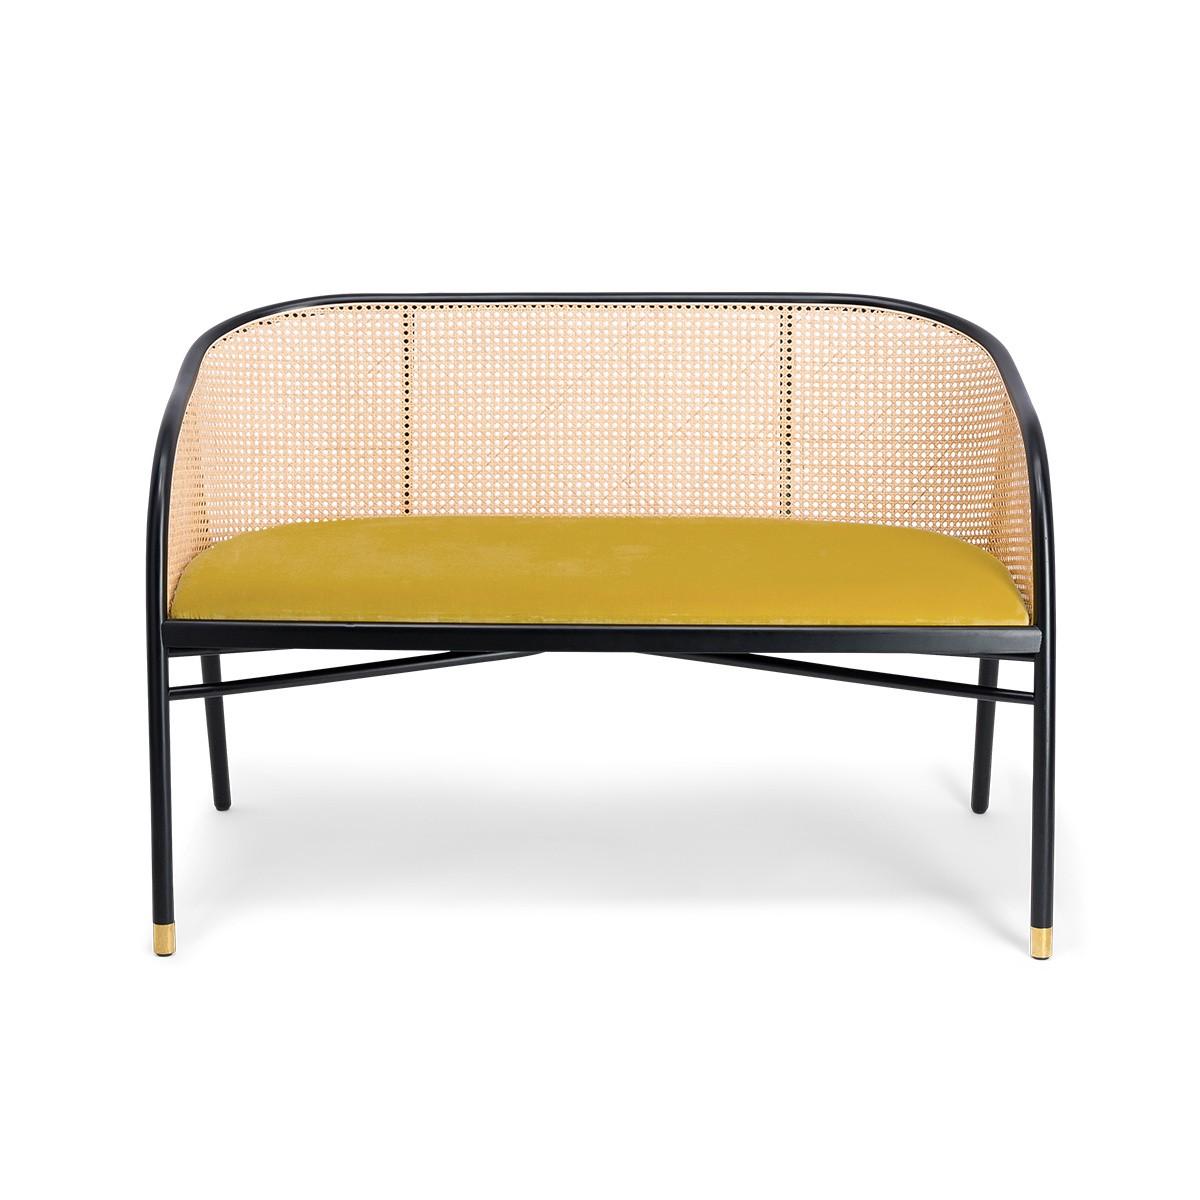 Cavallo Sofa, Yellow Velvet with Black Lacquered Frame